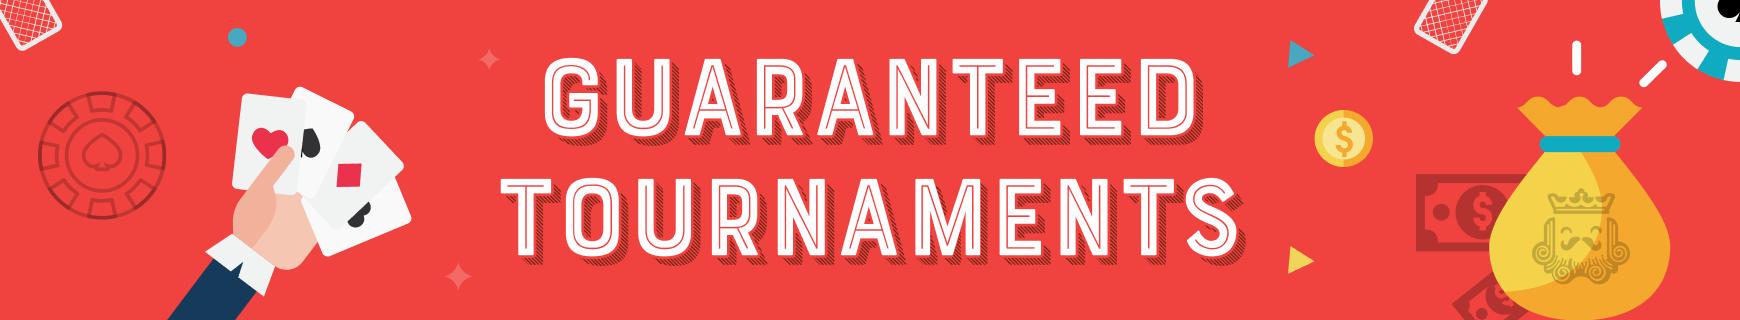 Guaranteed tournaments   dashboard %28870 x 160%29 2x